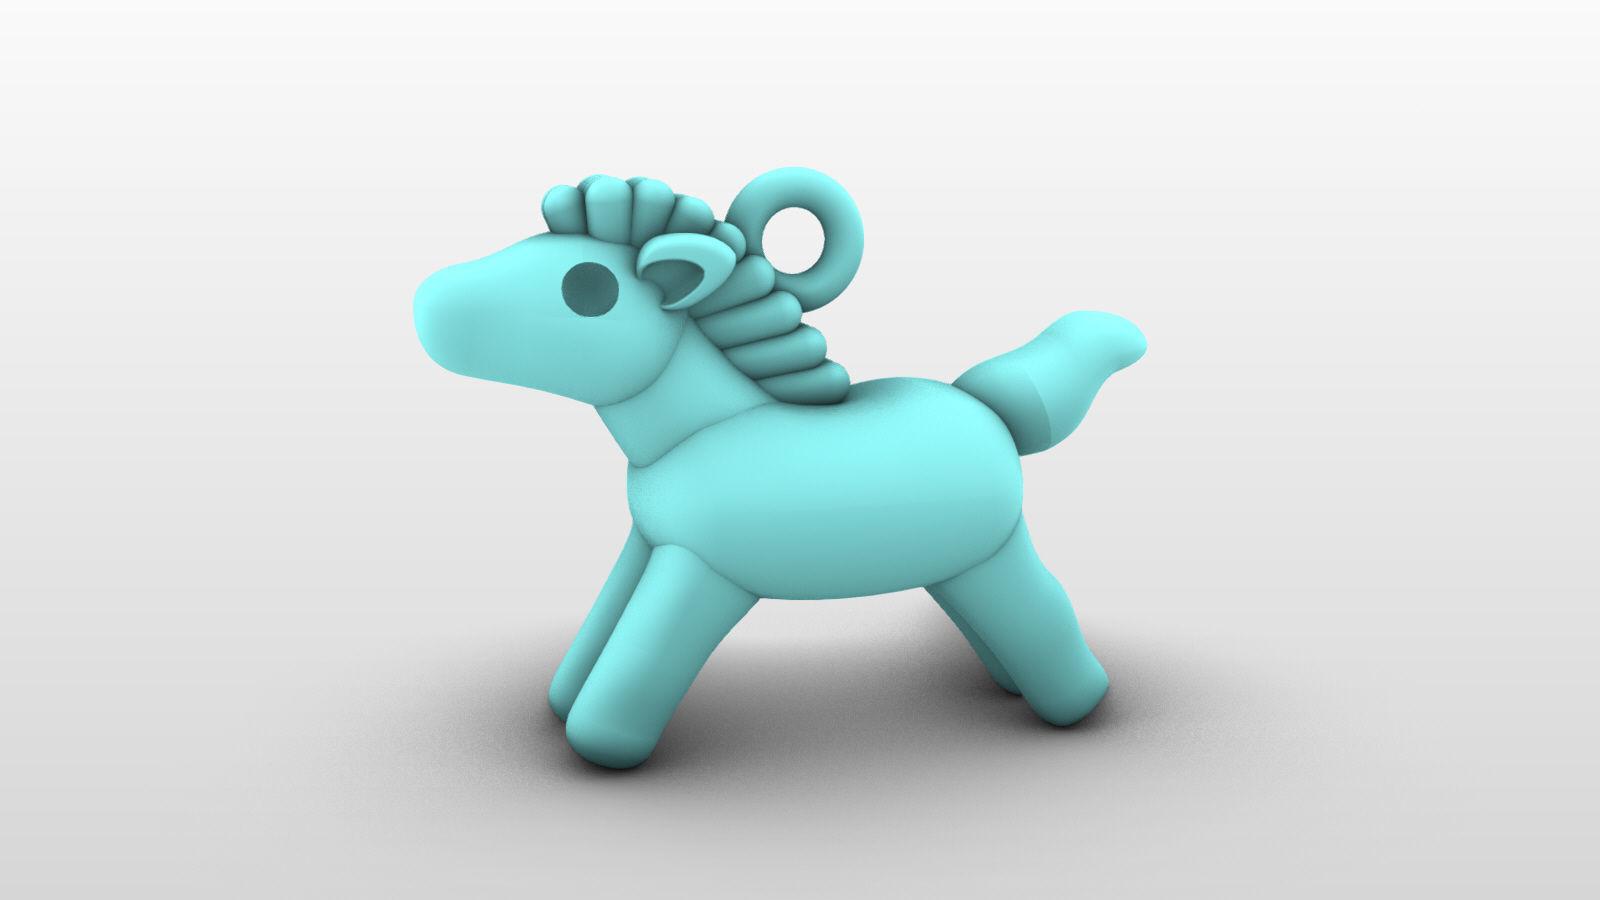 Charm Pendant - Adorable Little Animal - Horse